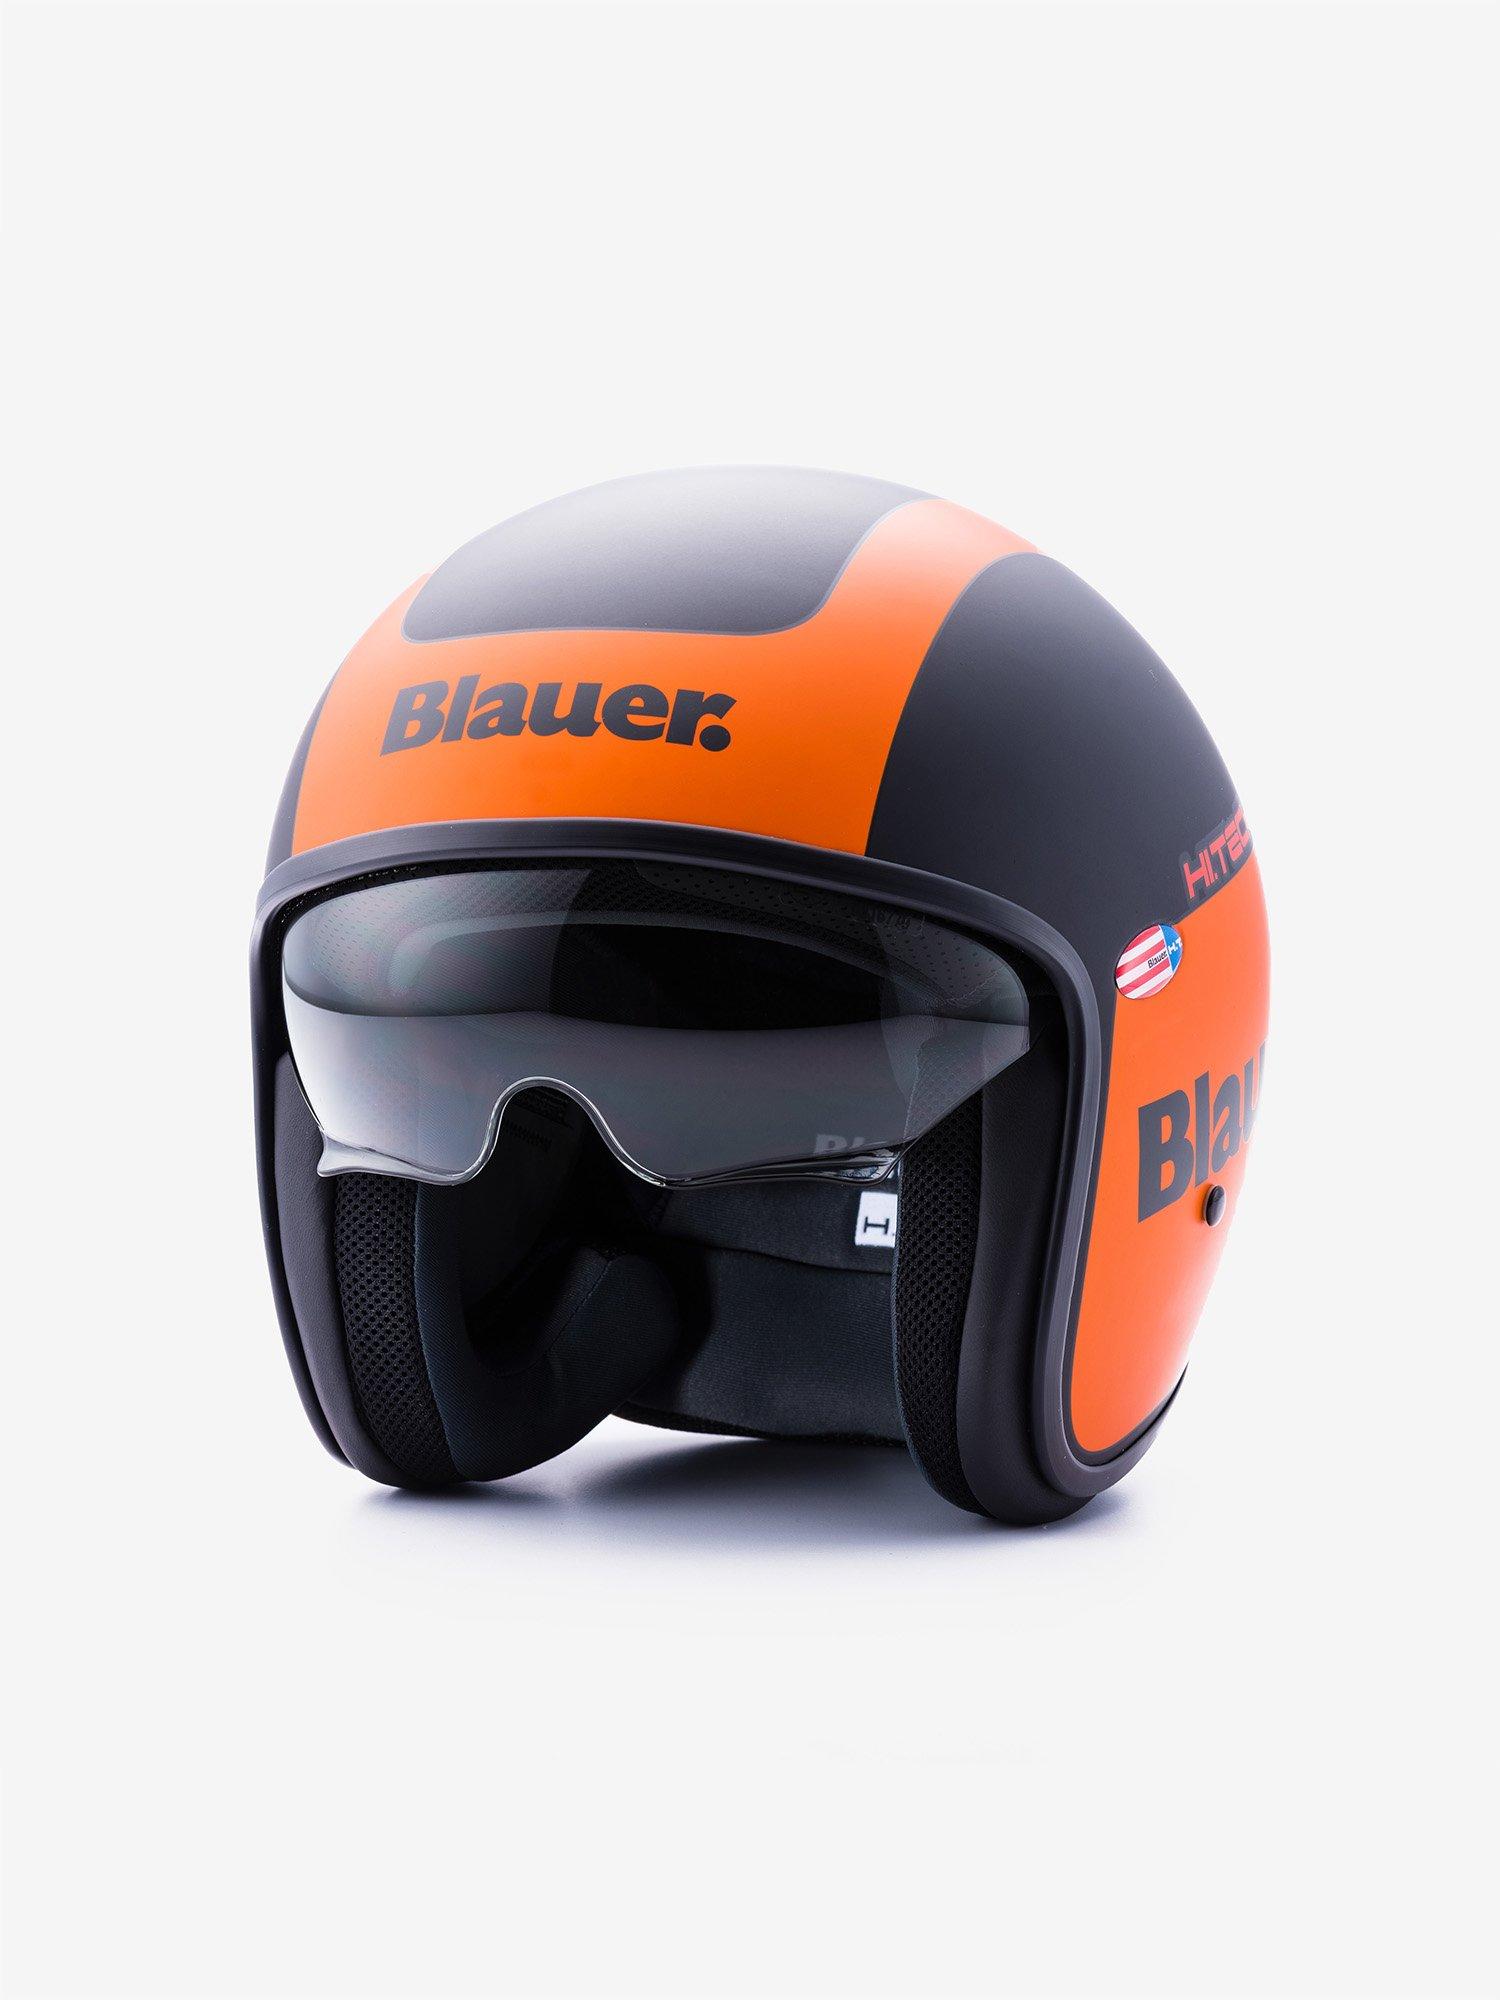 Blauer - PILOT 1.1 BICOLORE OPACO - Black / Orange Matt - Blauer